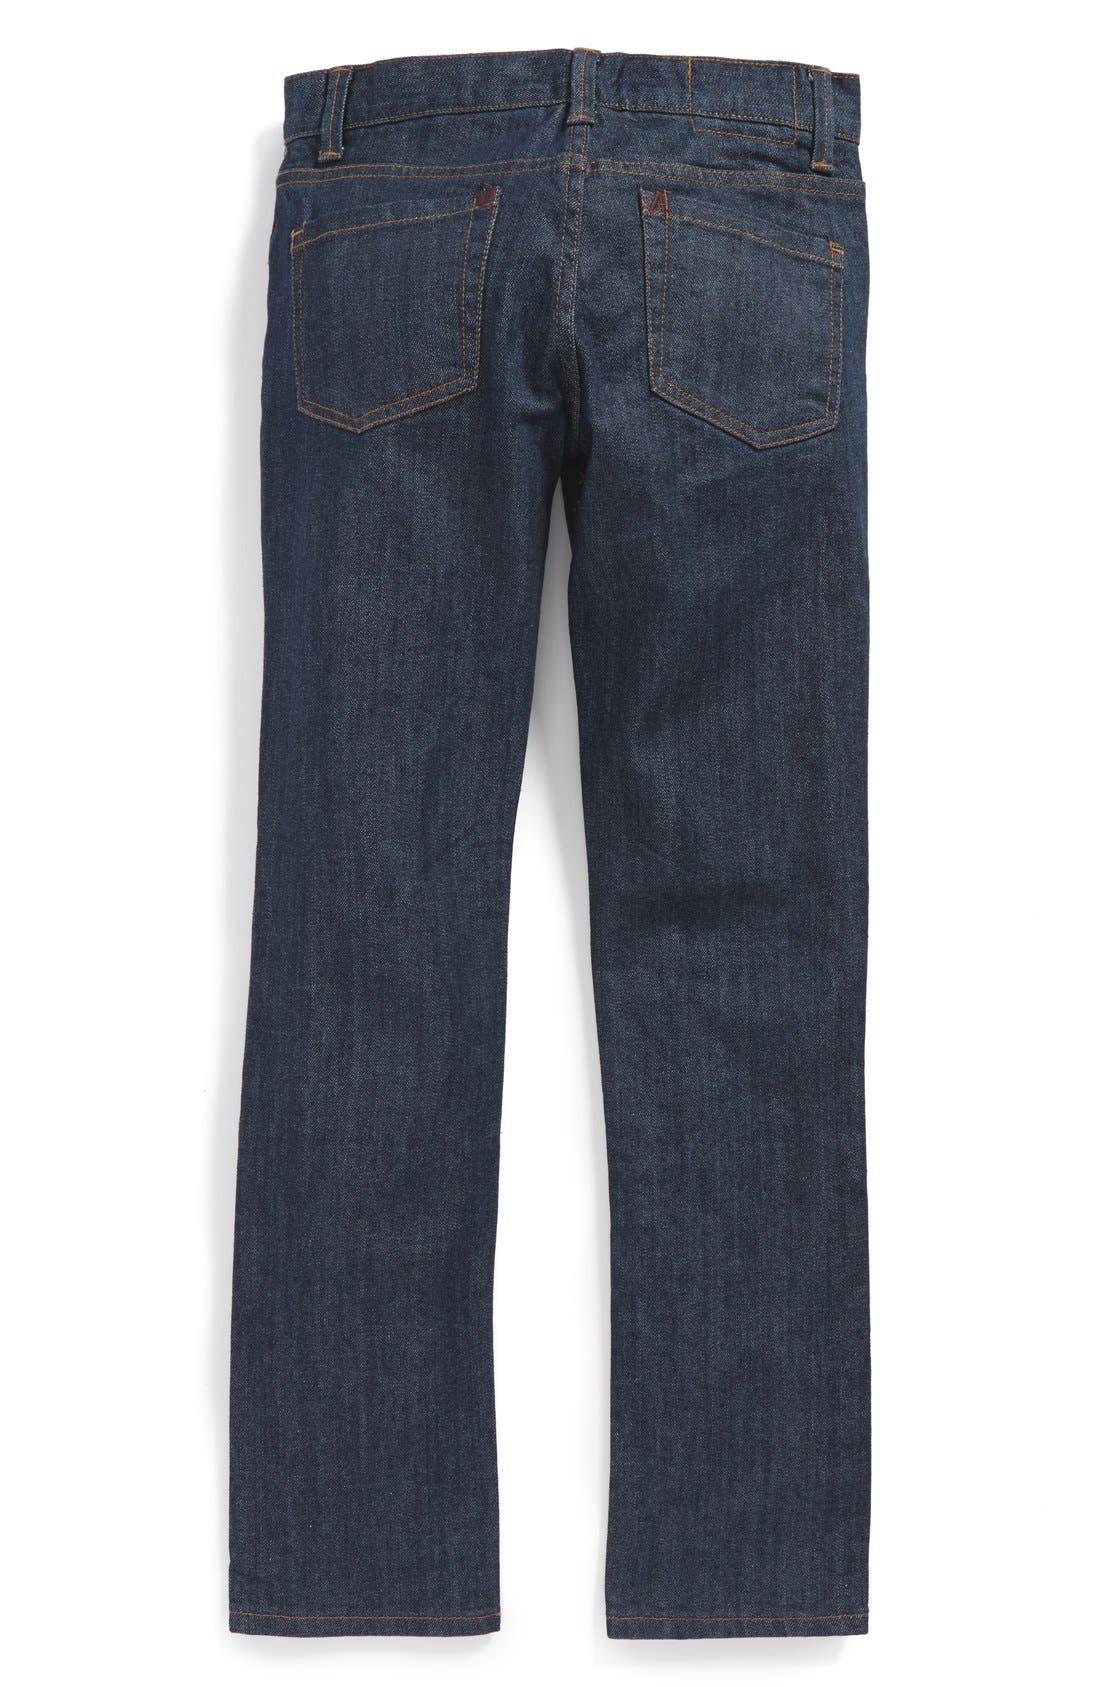 Alternate Image 1 Selected - RVCA 'Regulars Extra' Straight Leg Jeans (Big Boys)